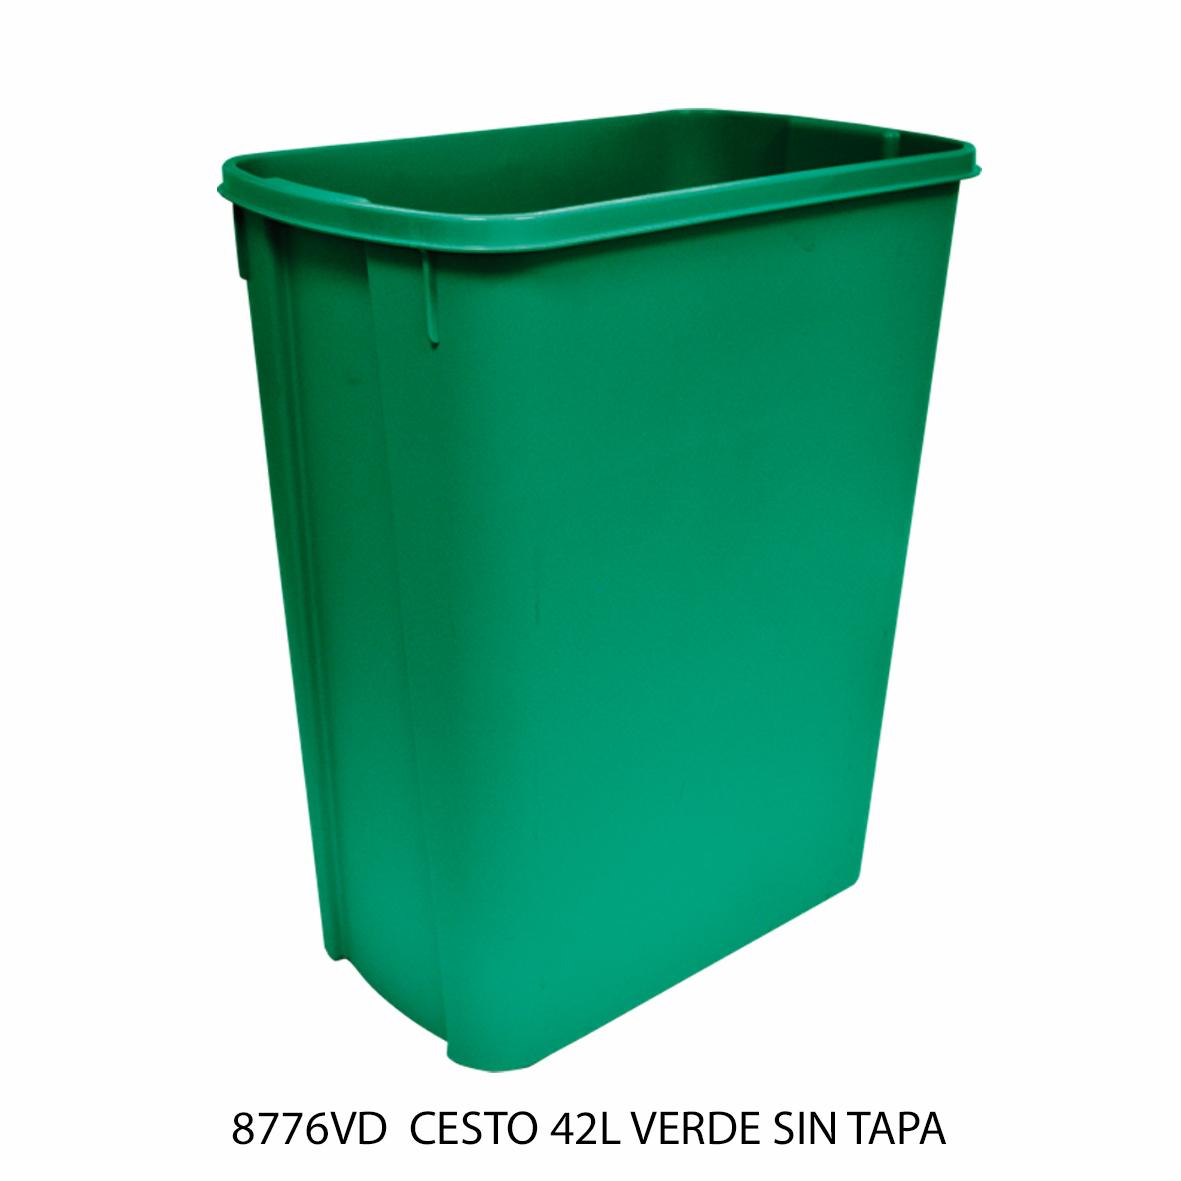 Bote de basura mediano de 42 litros sin tapa color verde modelo 8776VD de Sablón